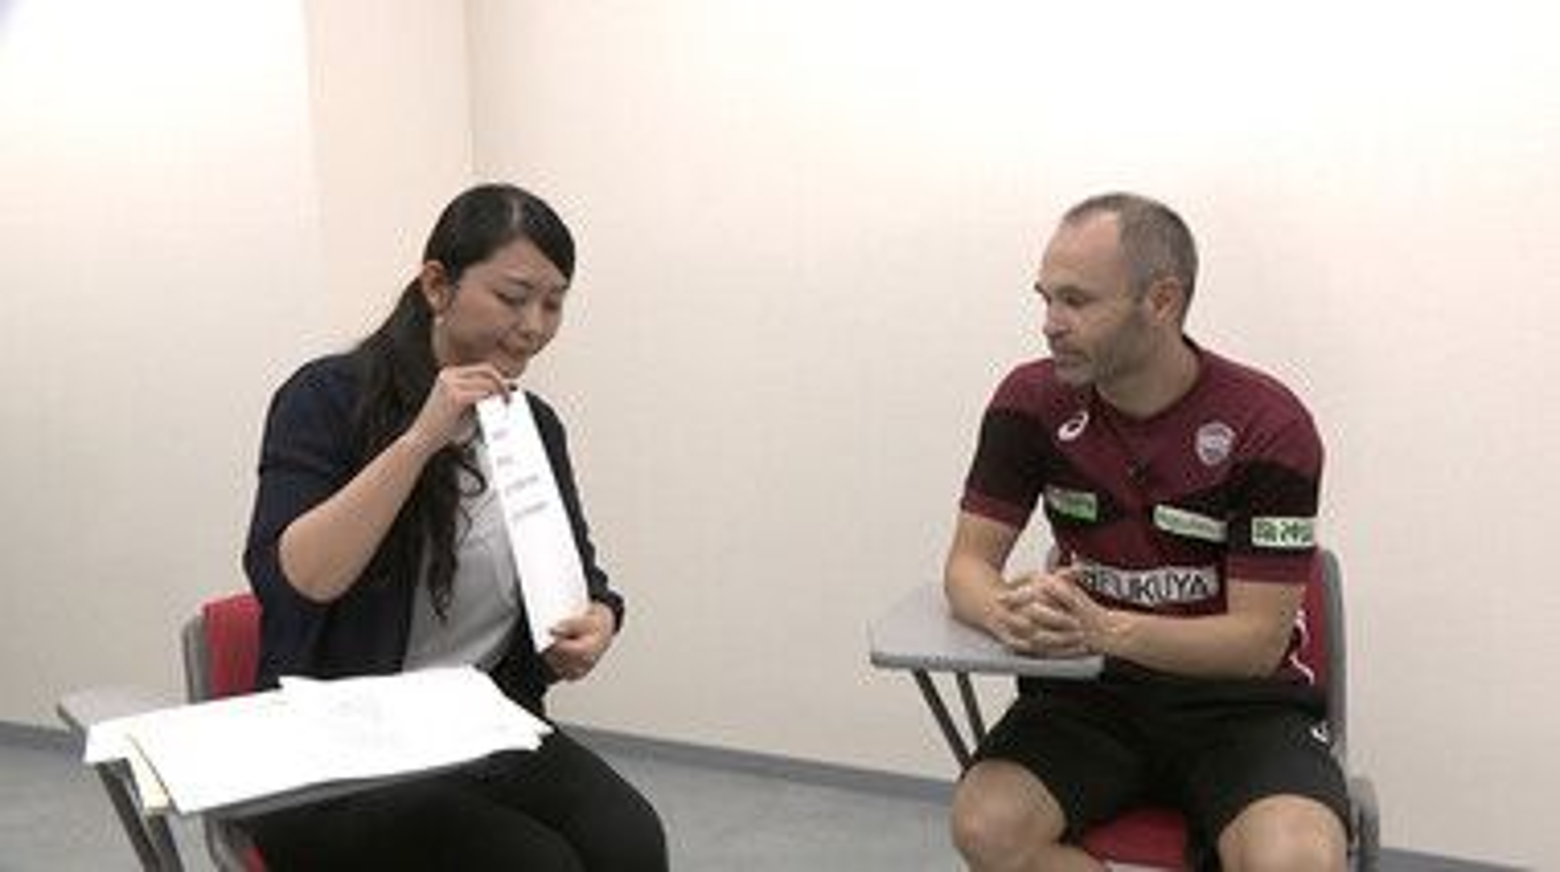 Iniesta TV: Discover Japan Episode 4: Discover Japan #3 Kanji Lesson 1